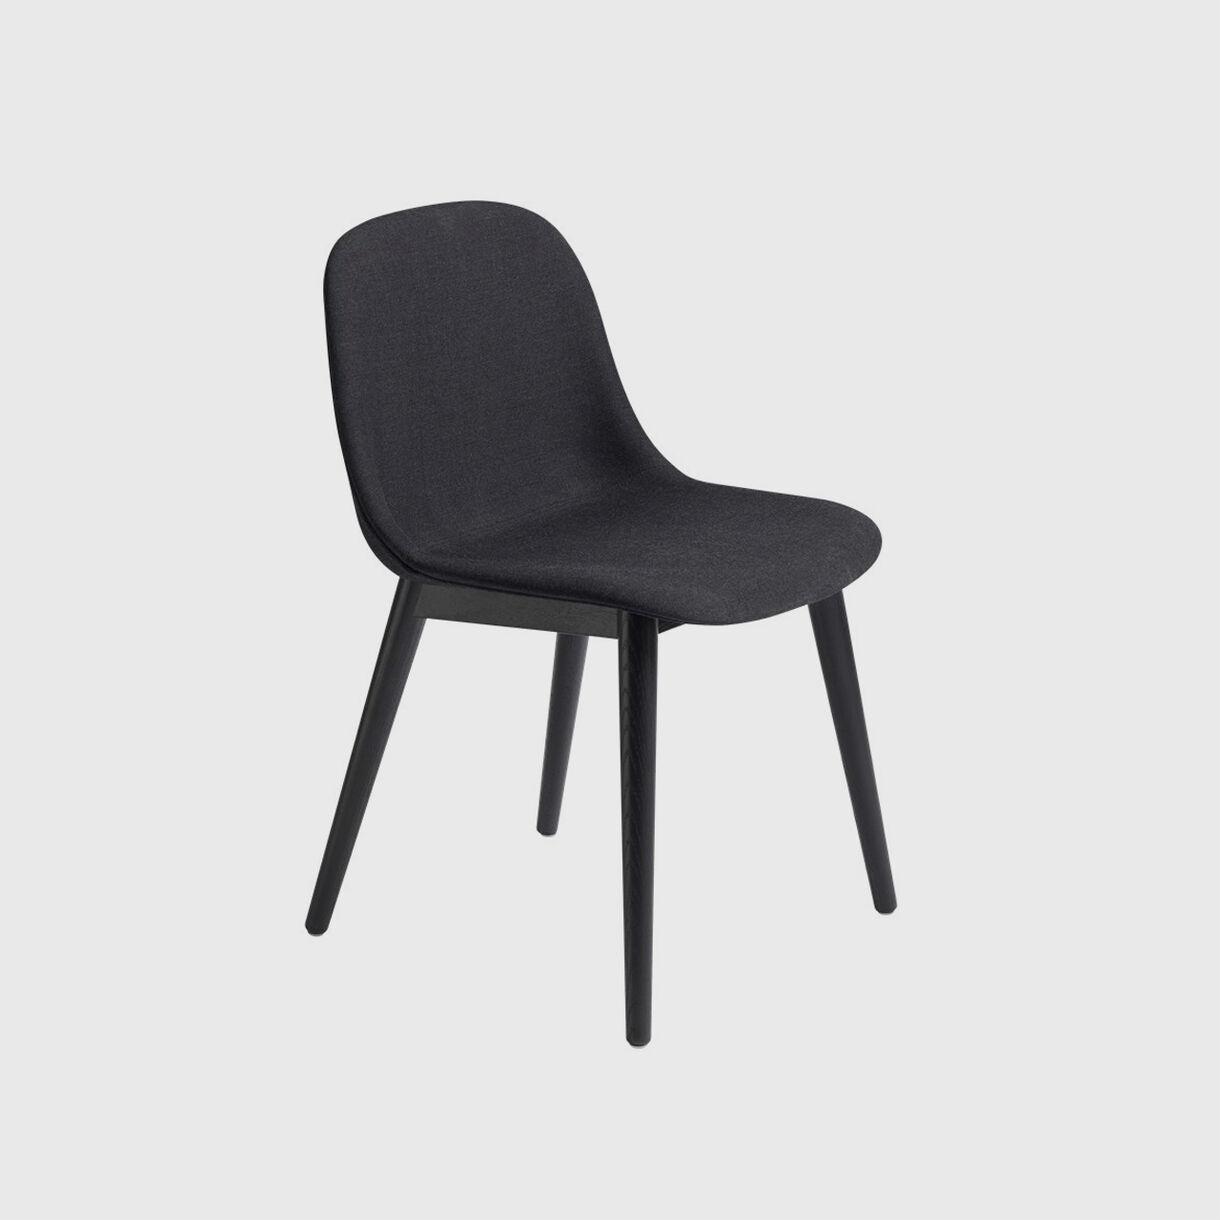 Fiber Side Chair Wood Base, Upholstered, Remix 183